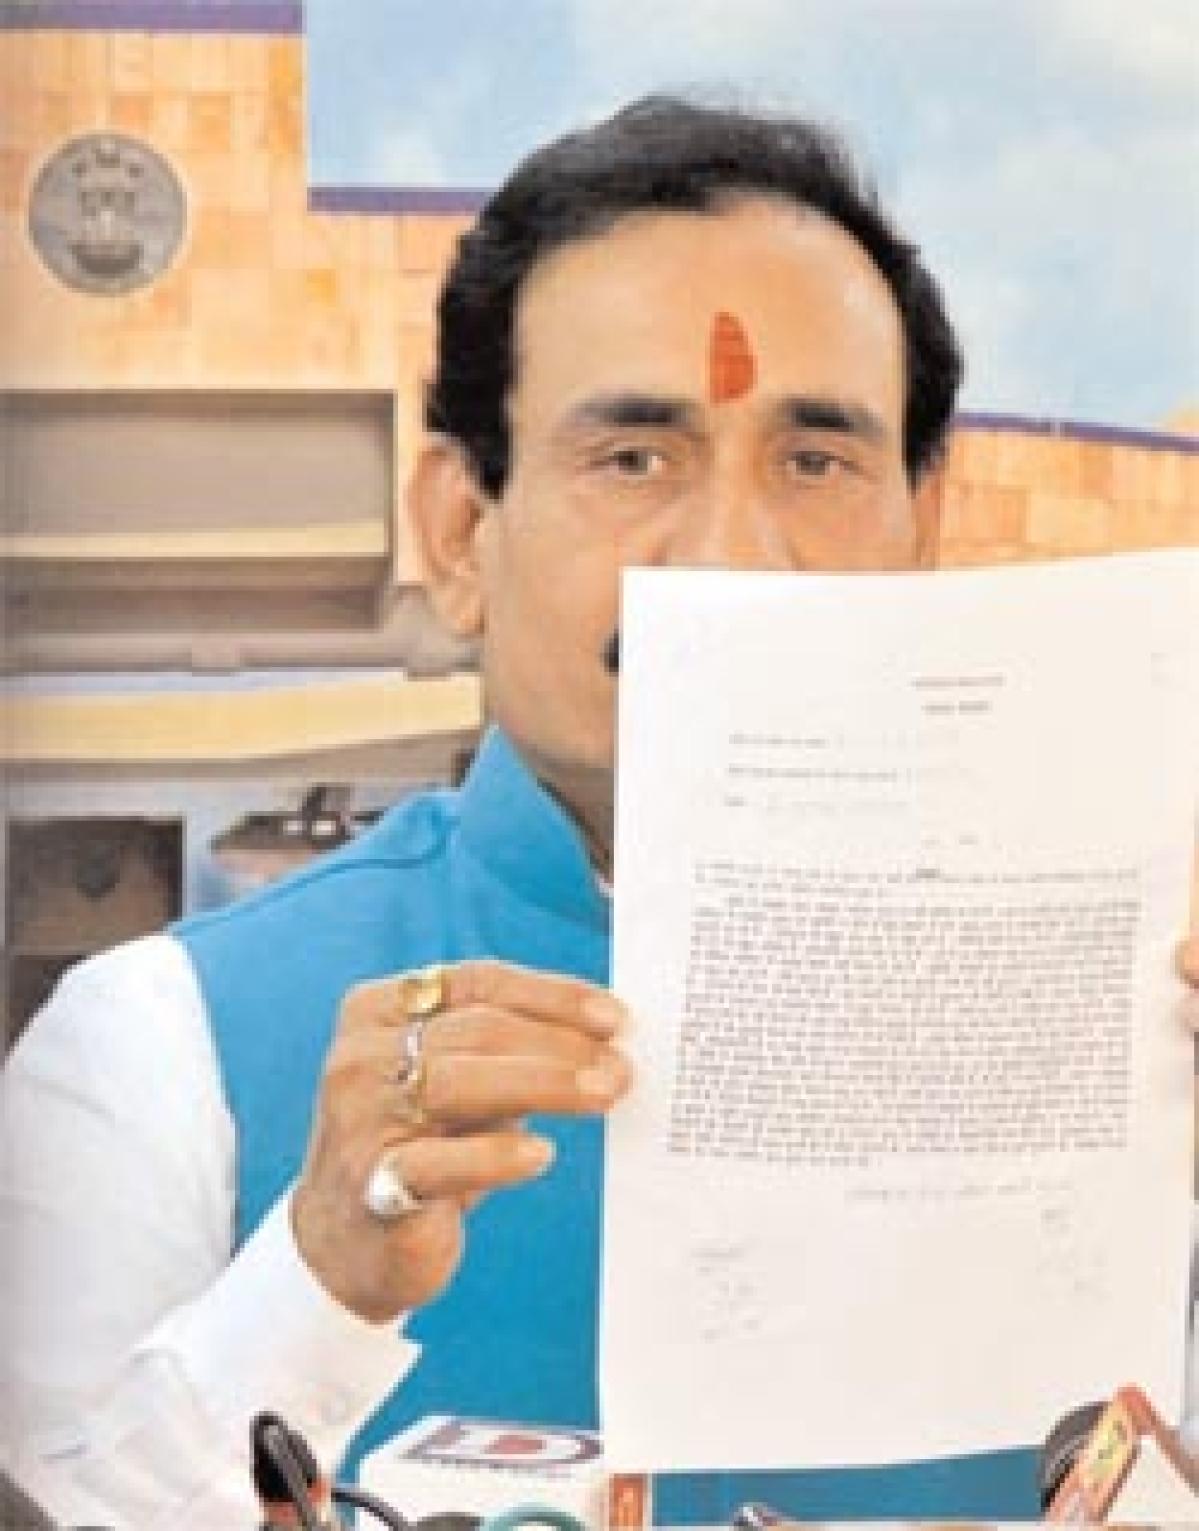 Bhopal: Demonetisation cured Kejriwal's cough, reunited Mulayam's family says Mishra